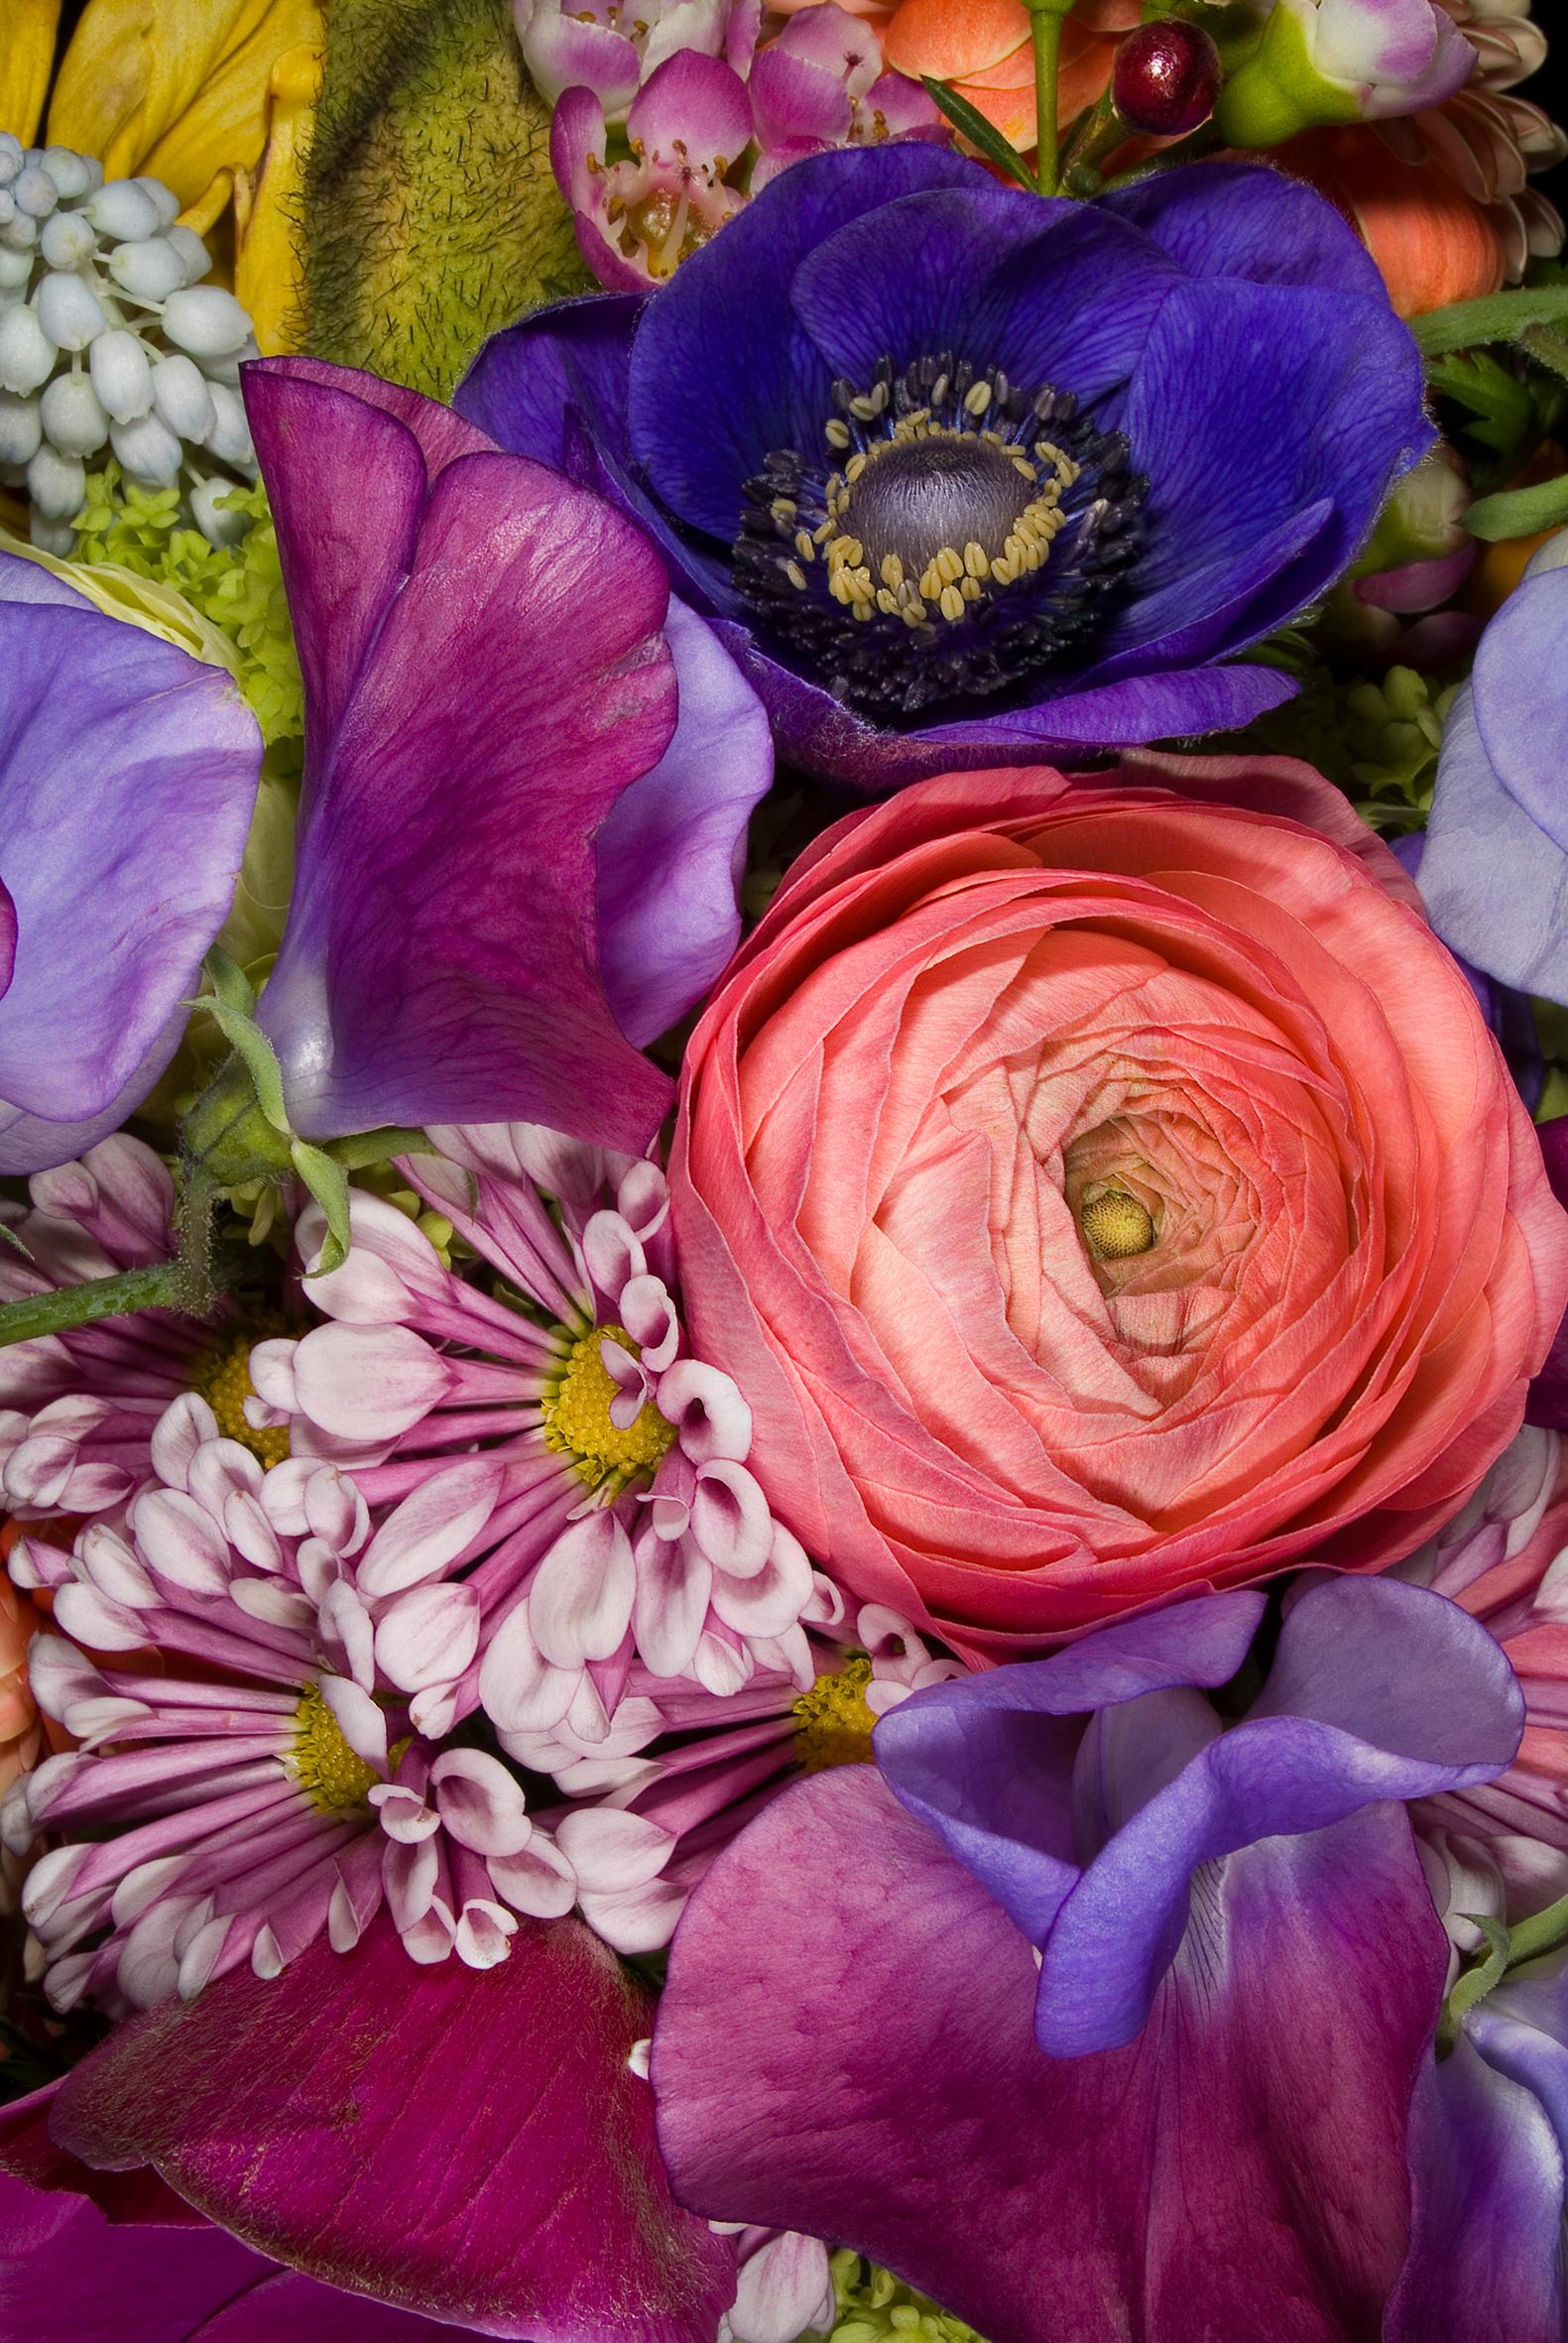 Blossom | Tableau | Anna Halm Schudel